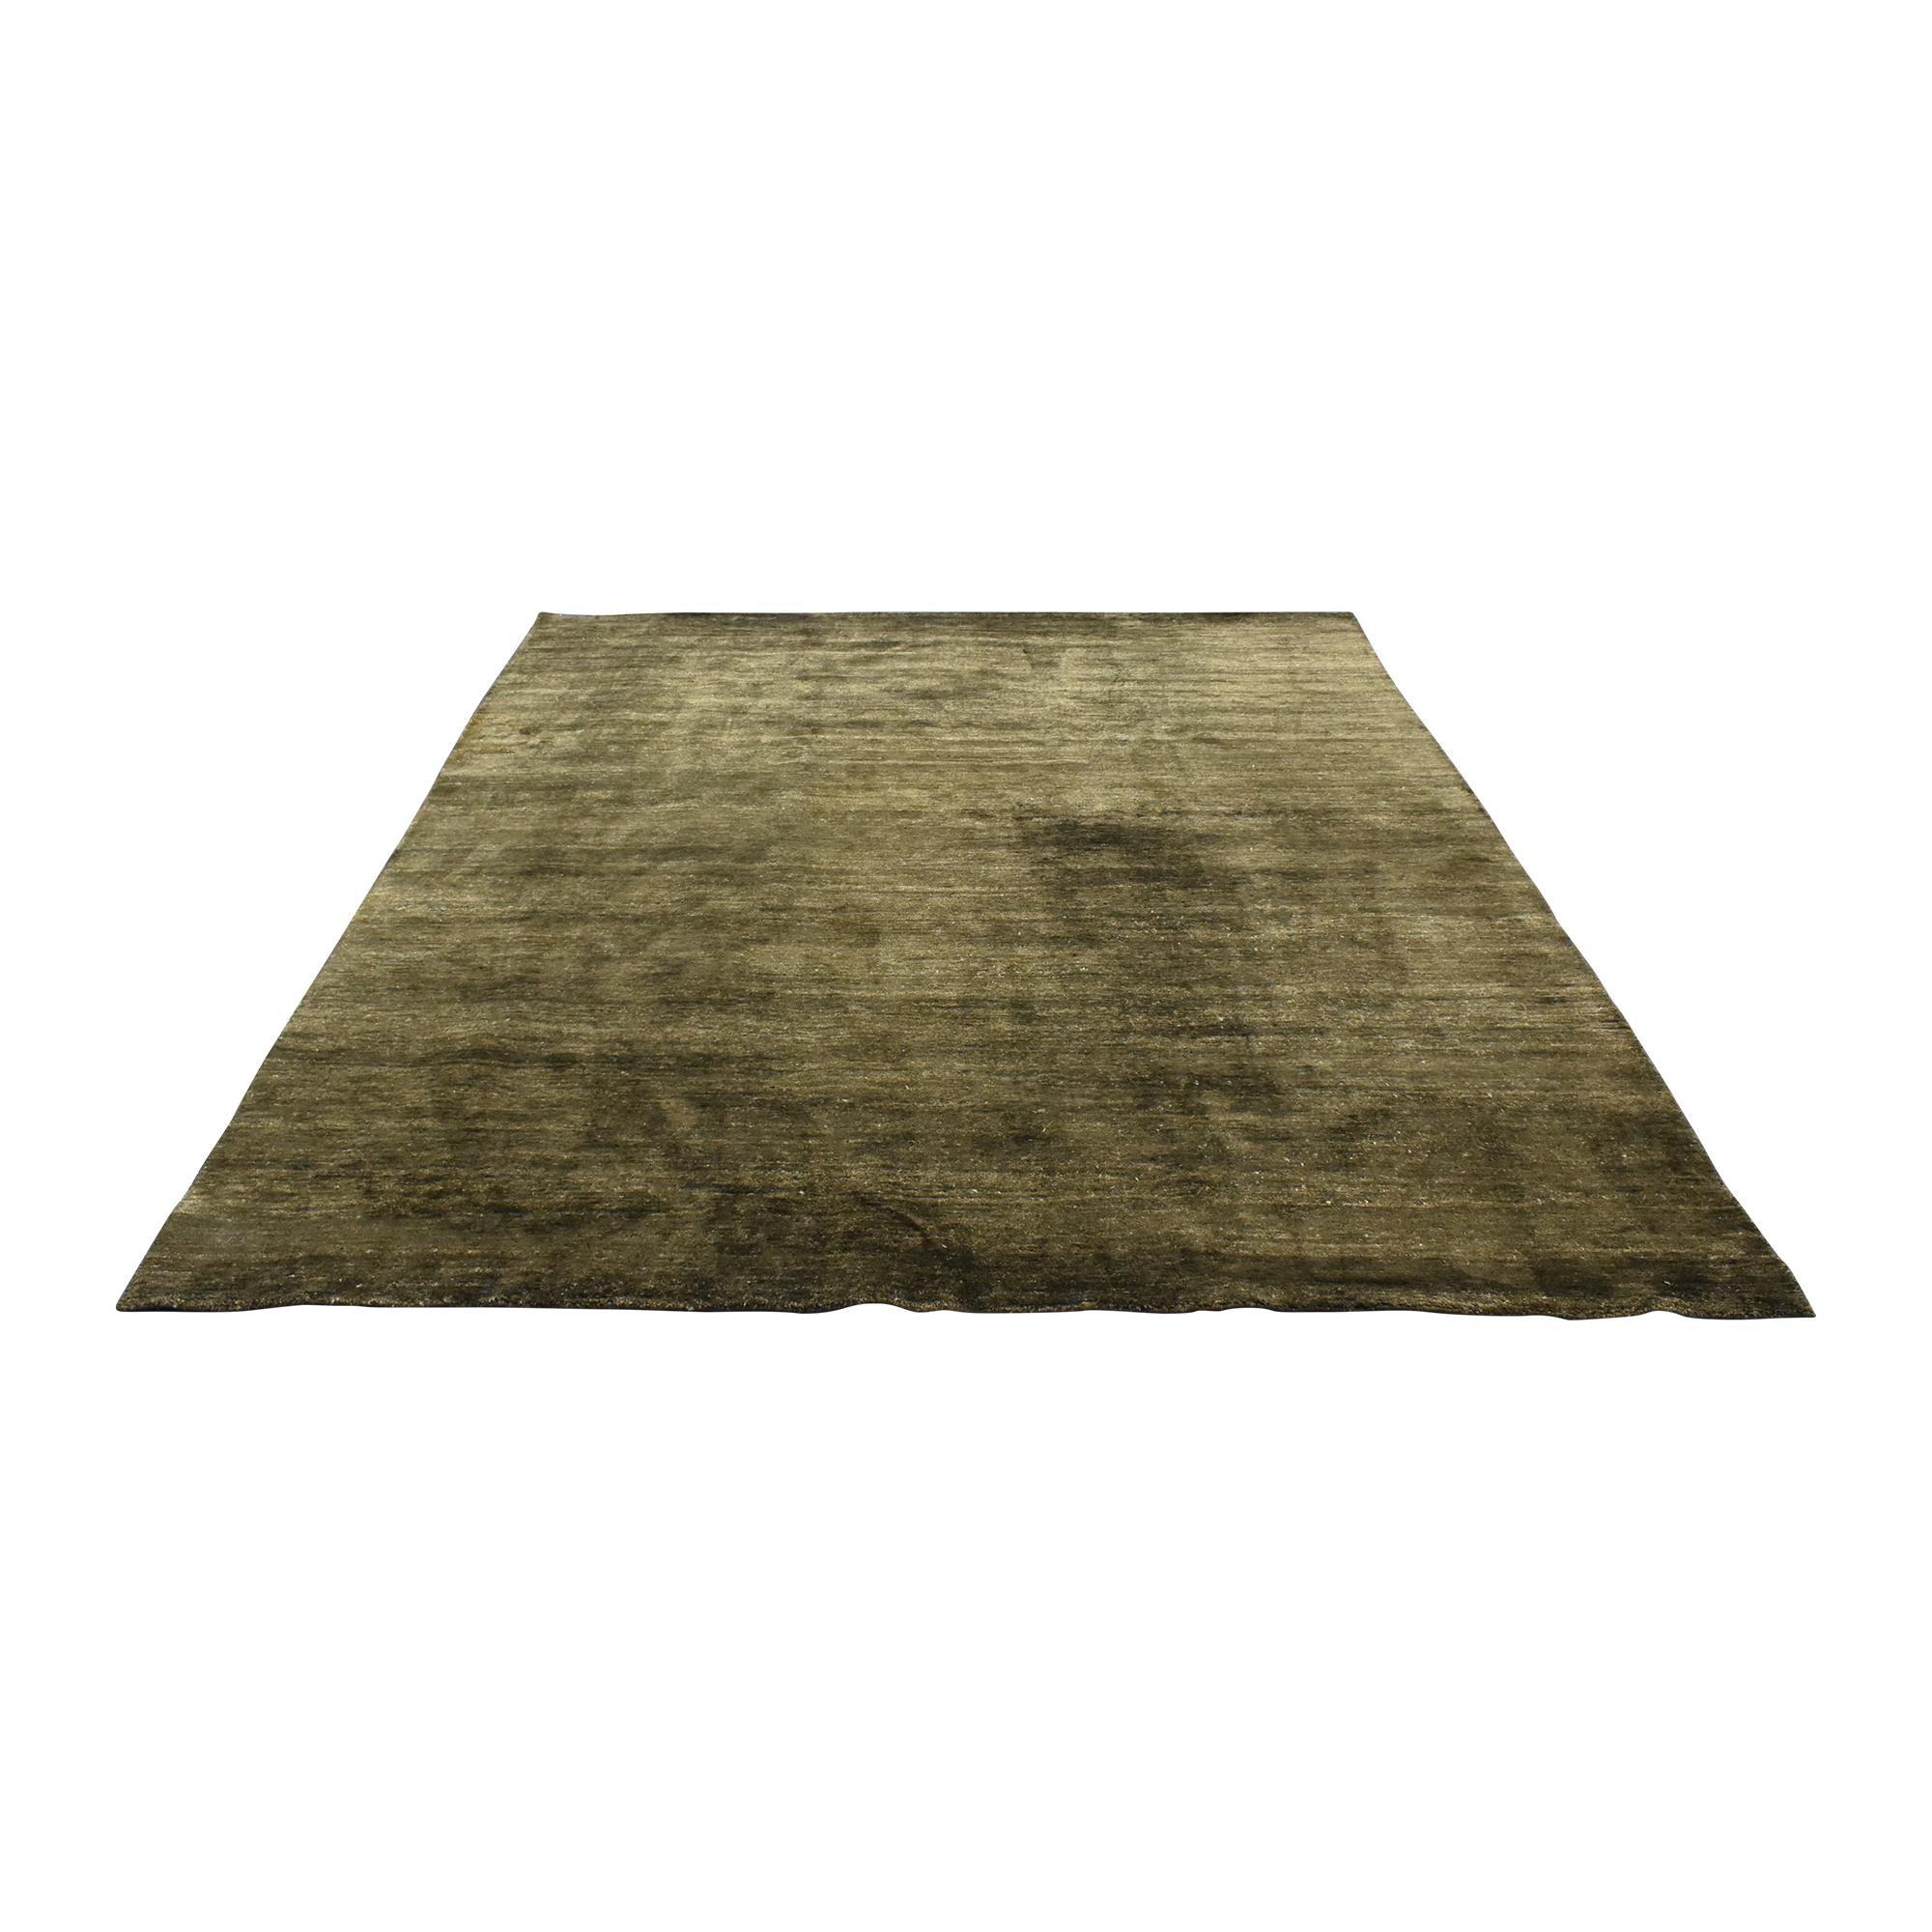 ABC Carpet & Home ABC Carpet & Home Tonal Area Rug for sale